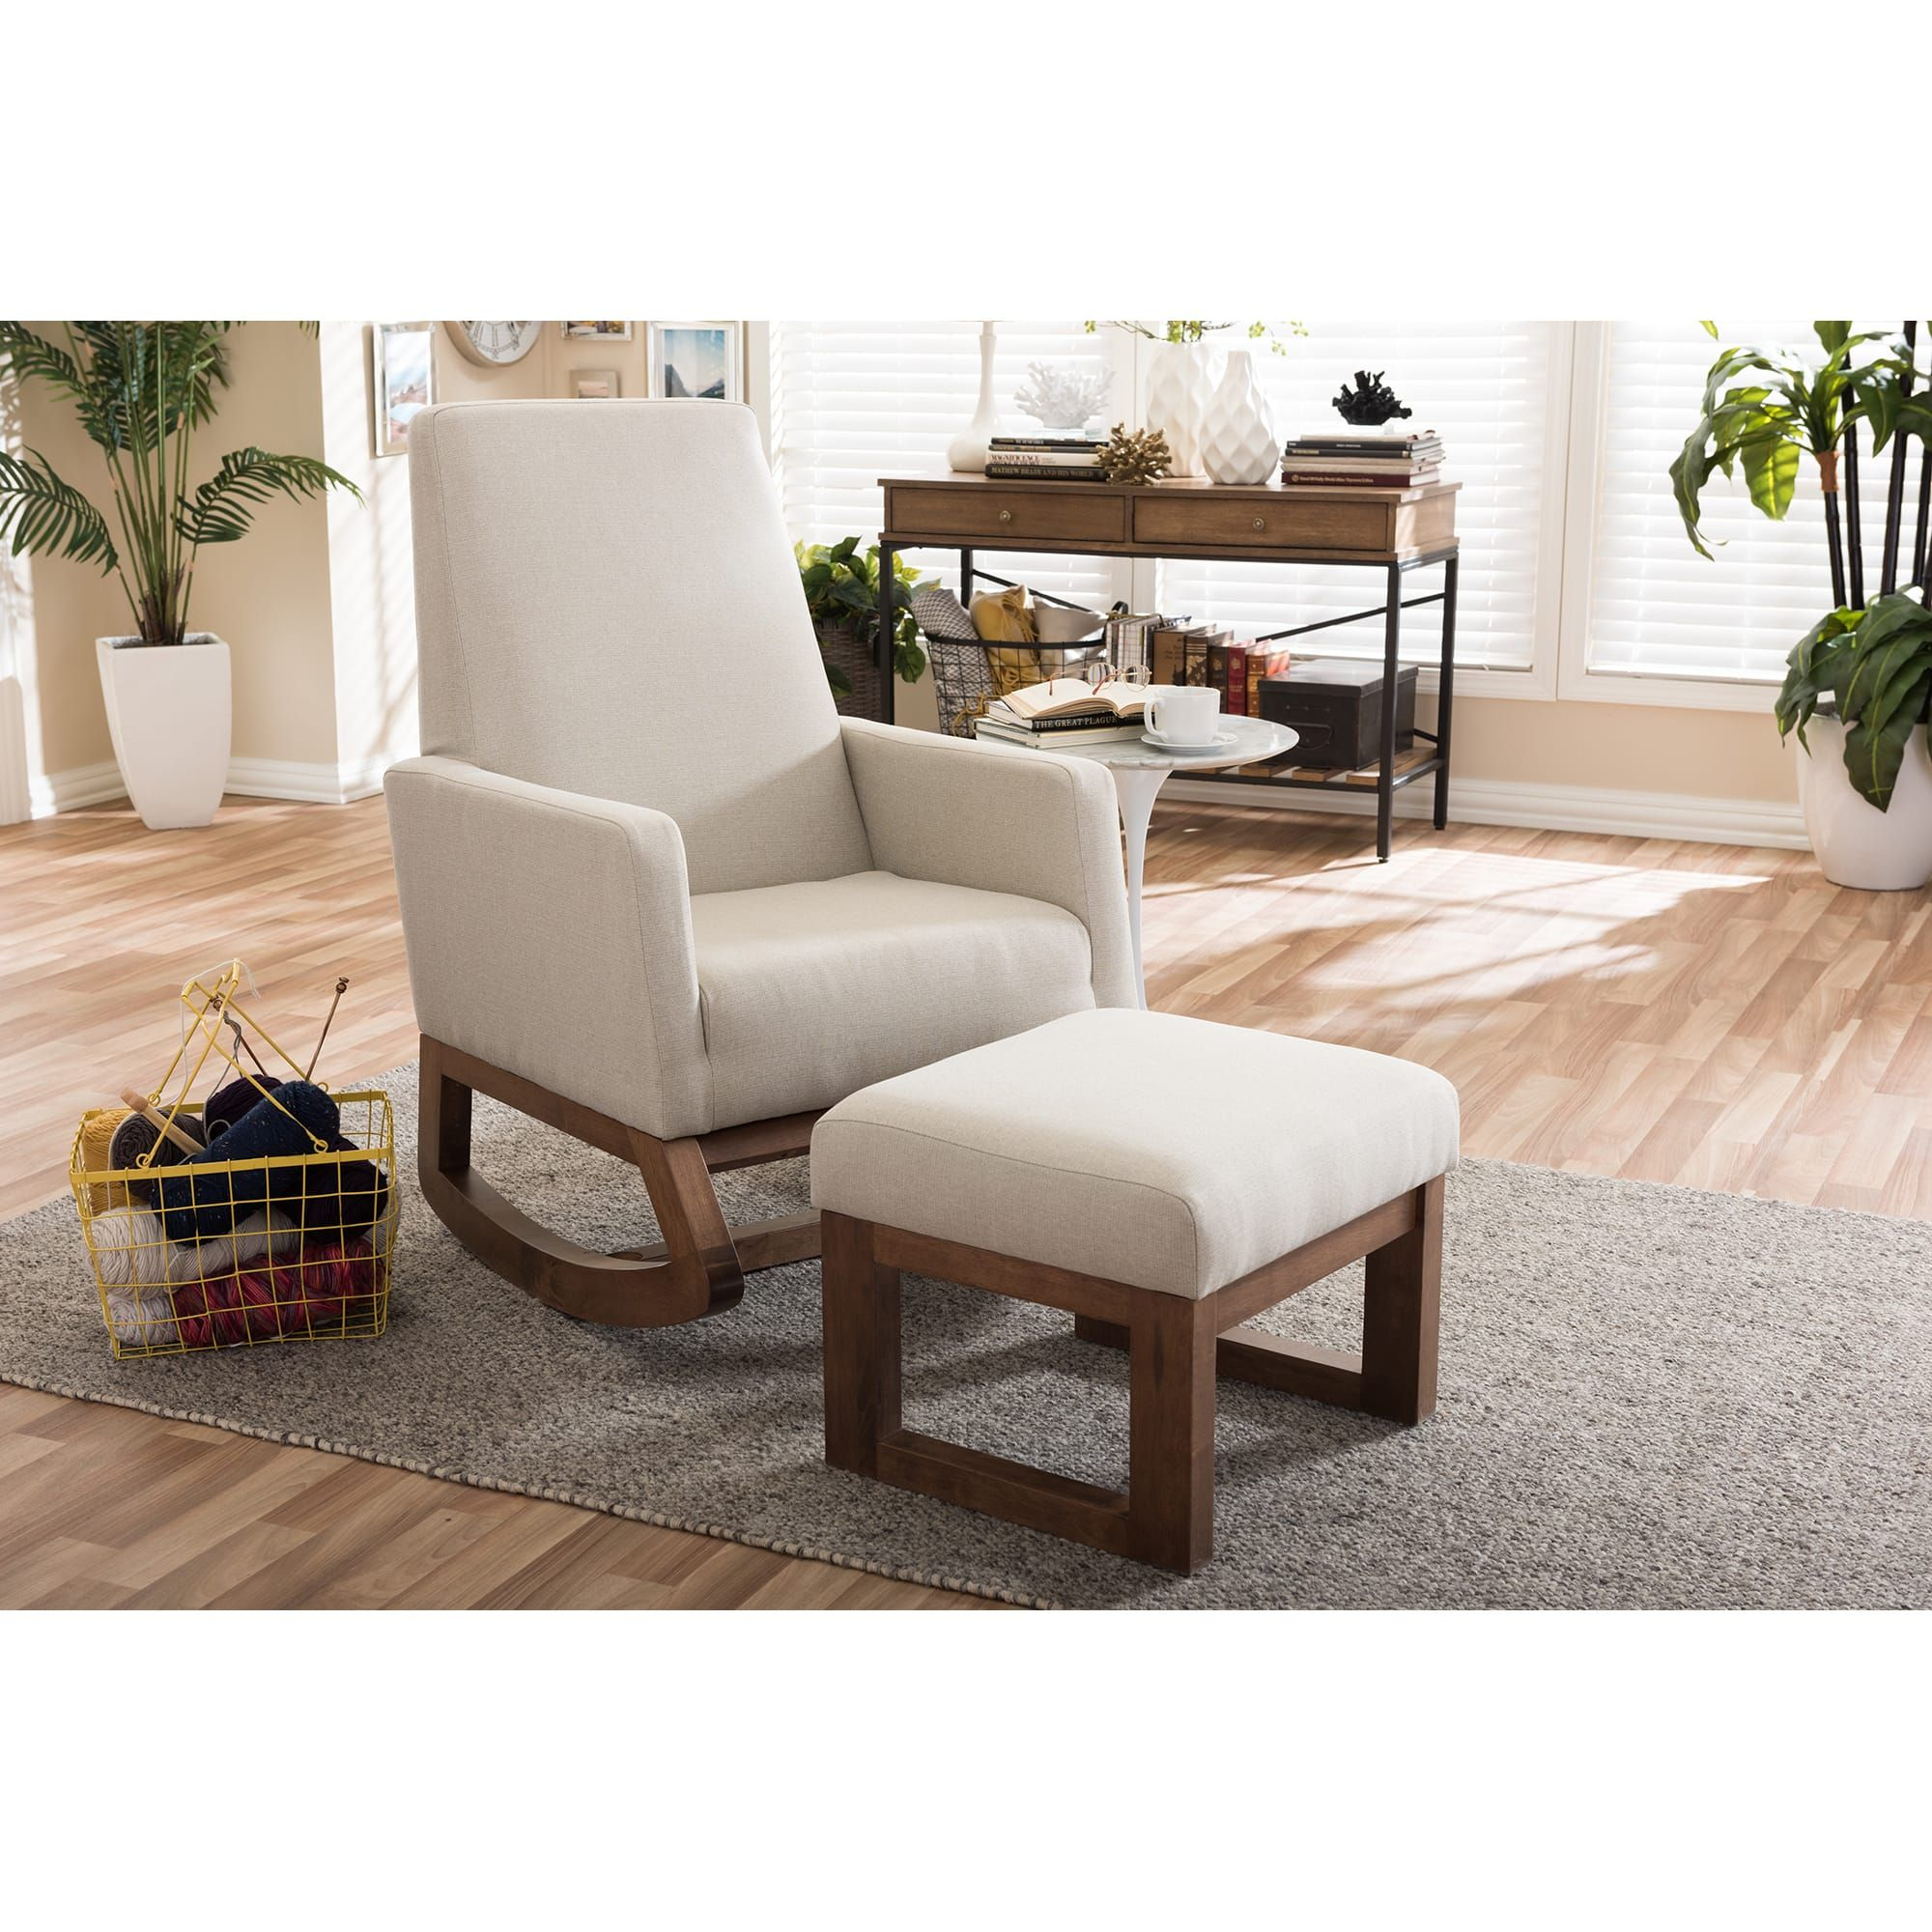 Buy Living Room Furniture Sets Online at Overstock   Our ...